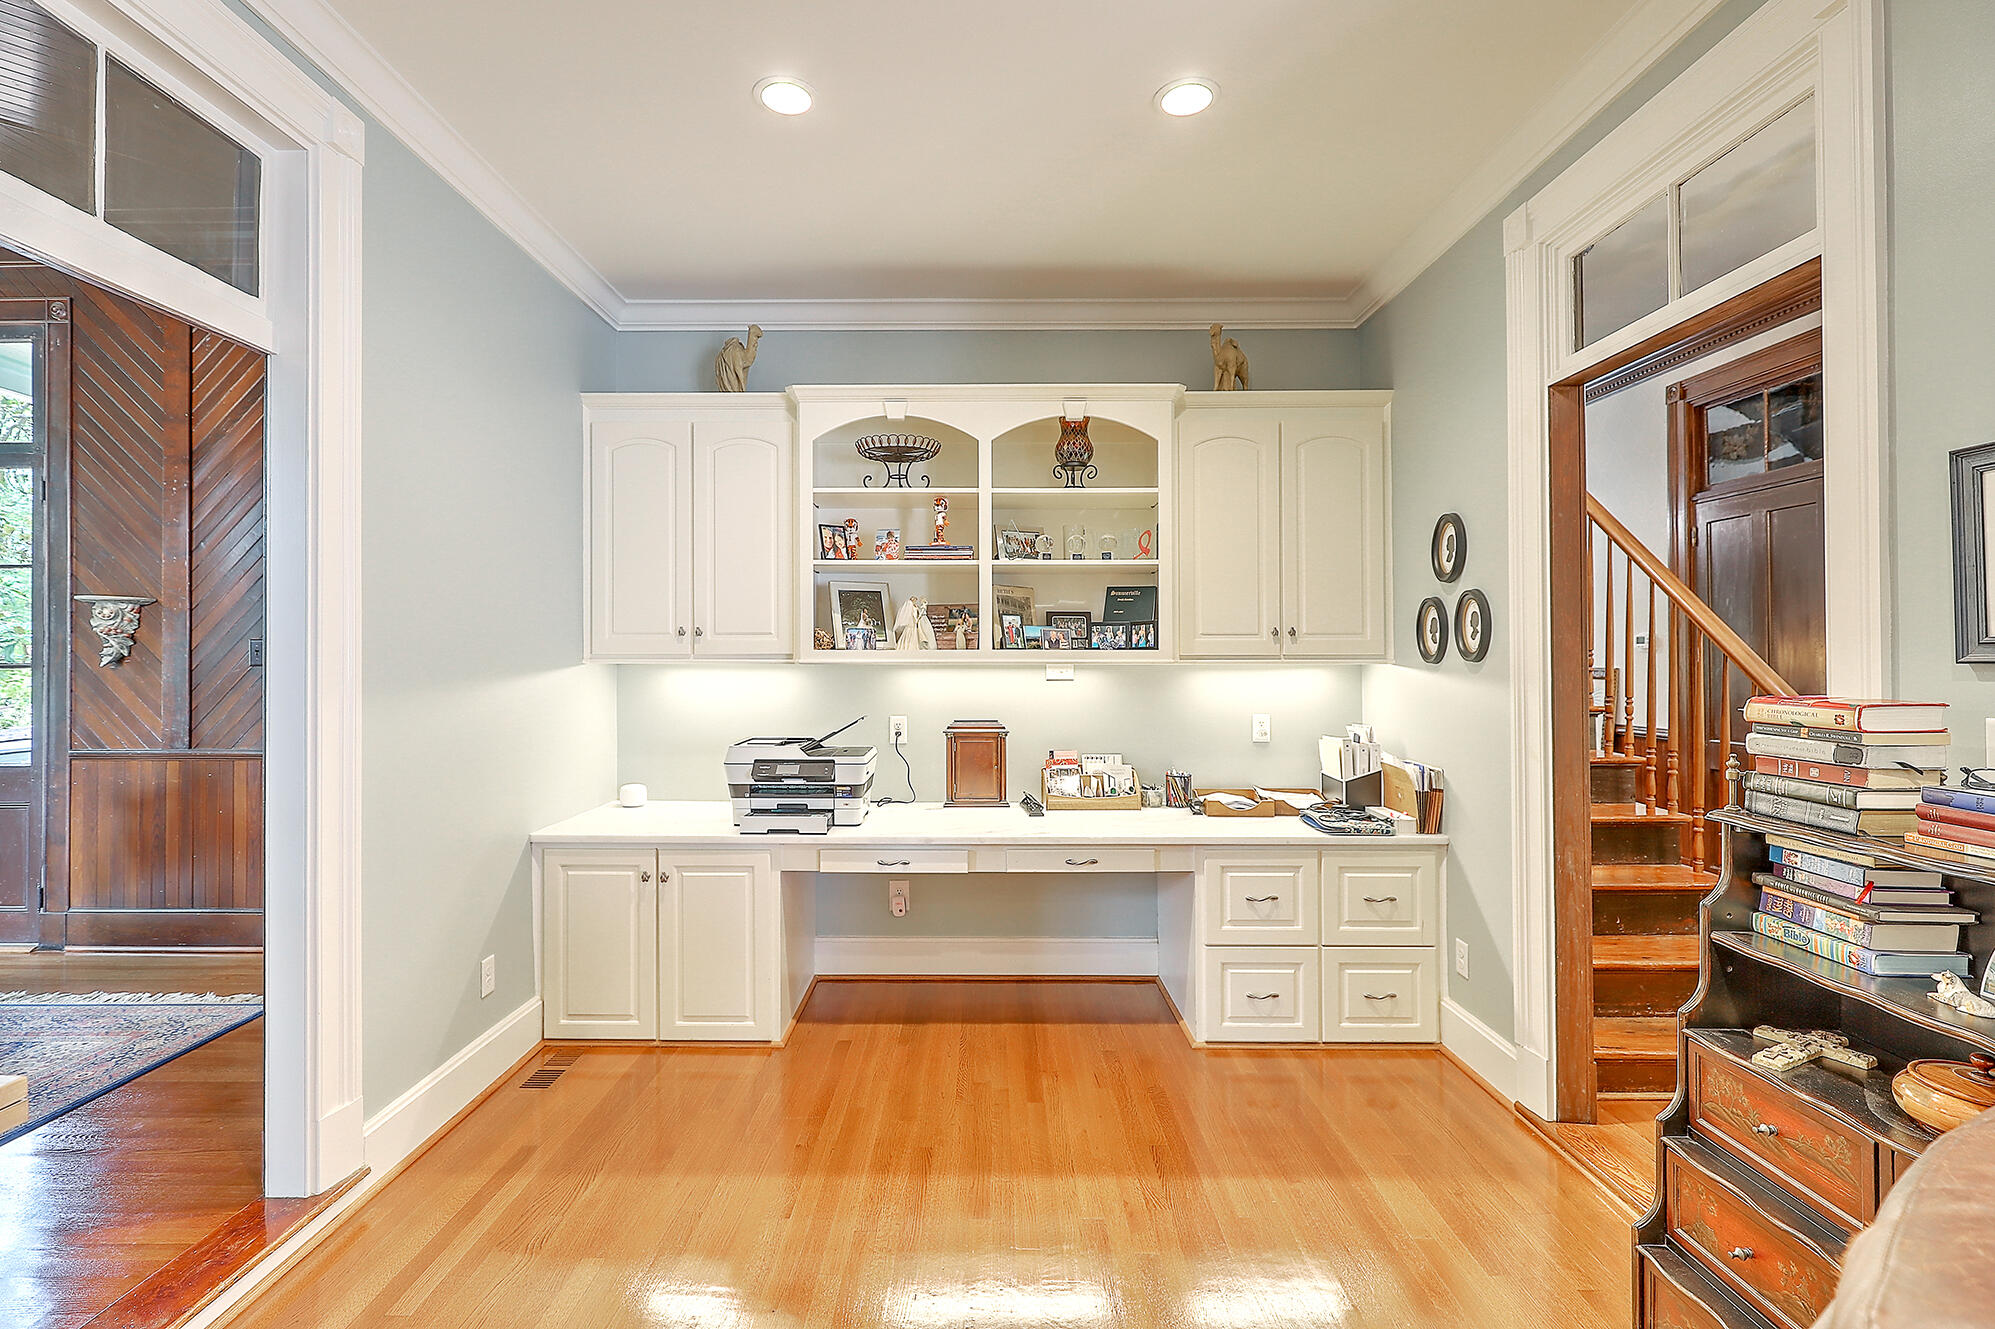 Summerville Homes For Sale - 102 Hickory, Summerville, SC - 57